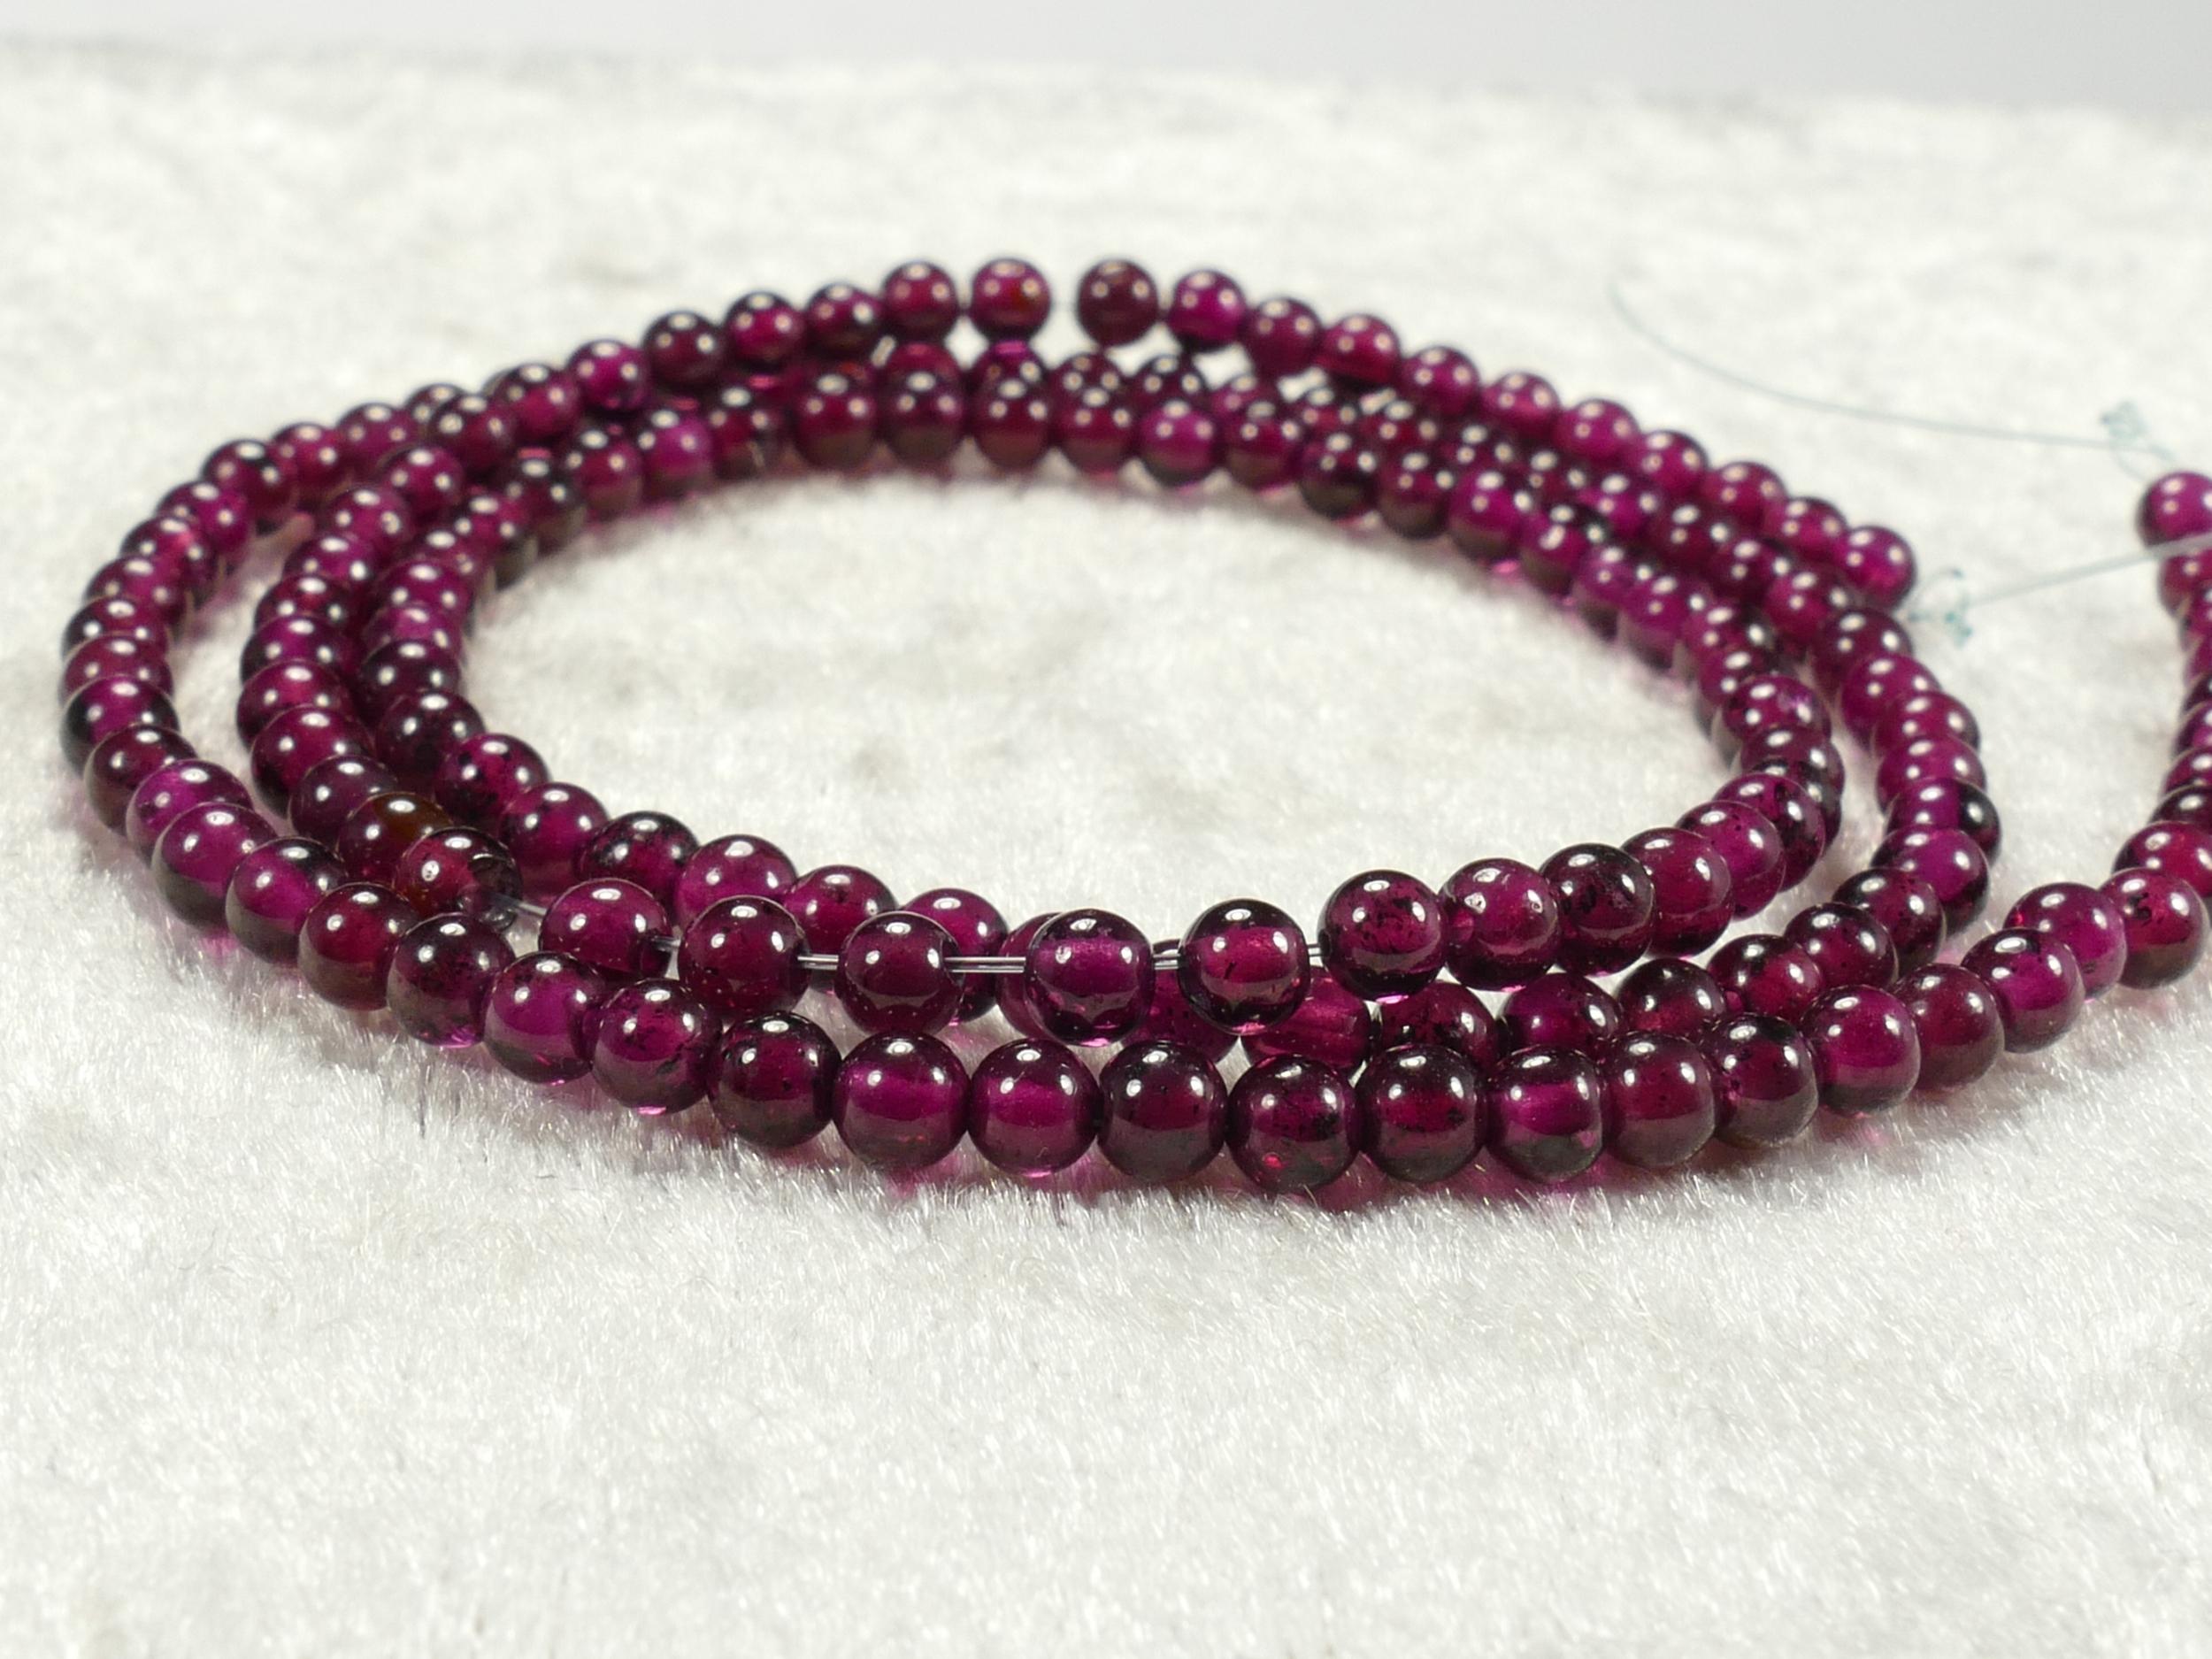 3/3.2mm Perles de Grenat rouge violet naturel boule / ronde lisse d\'Inde x20cm (7.8inch) (#AC580)